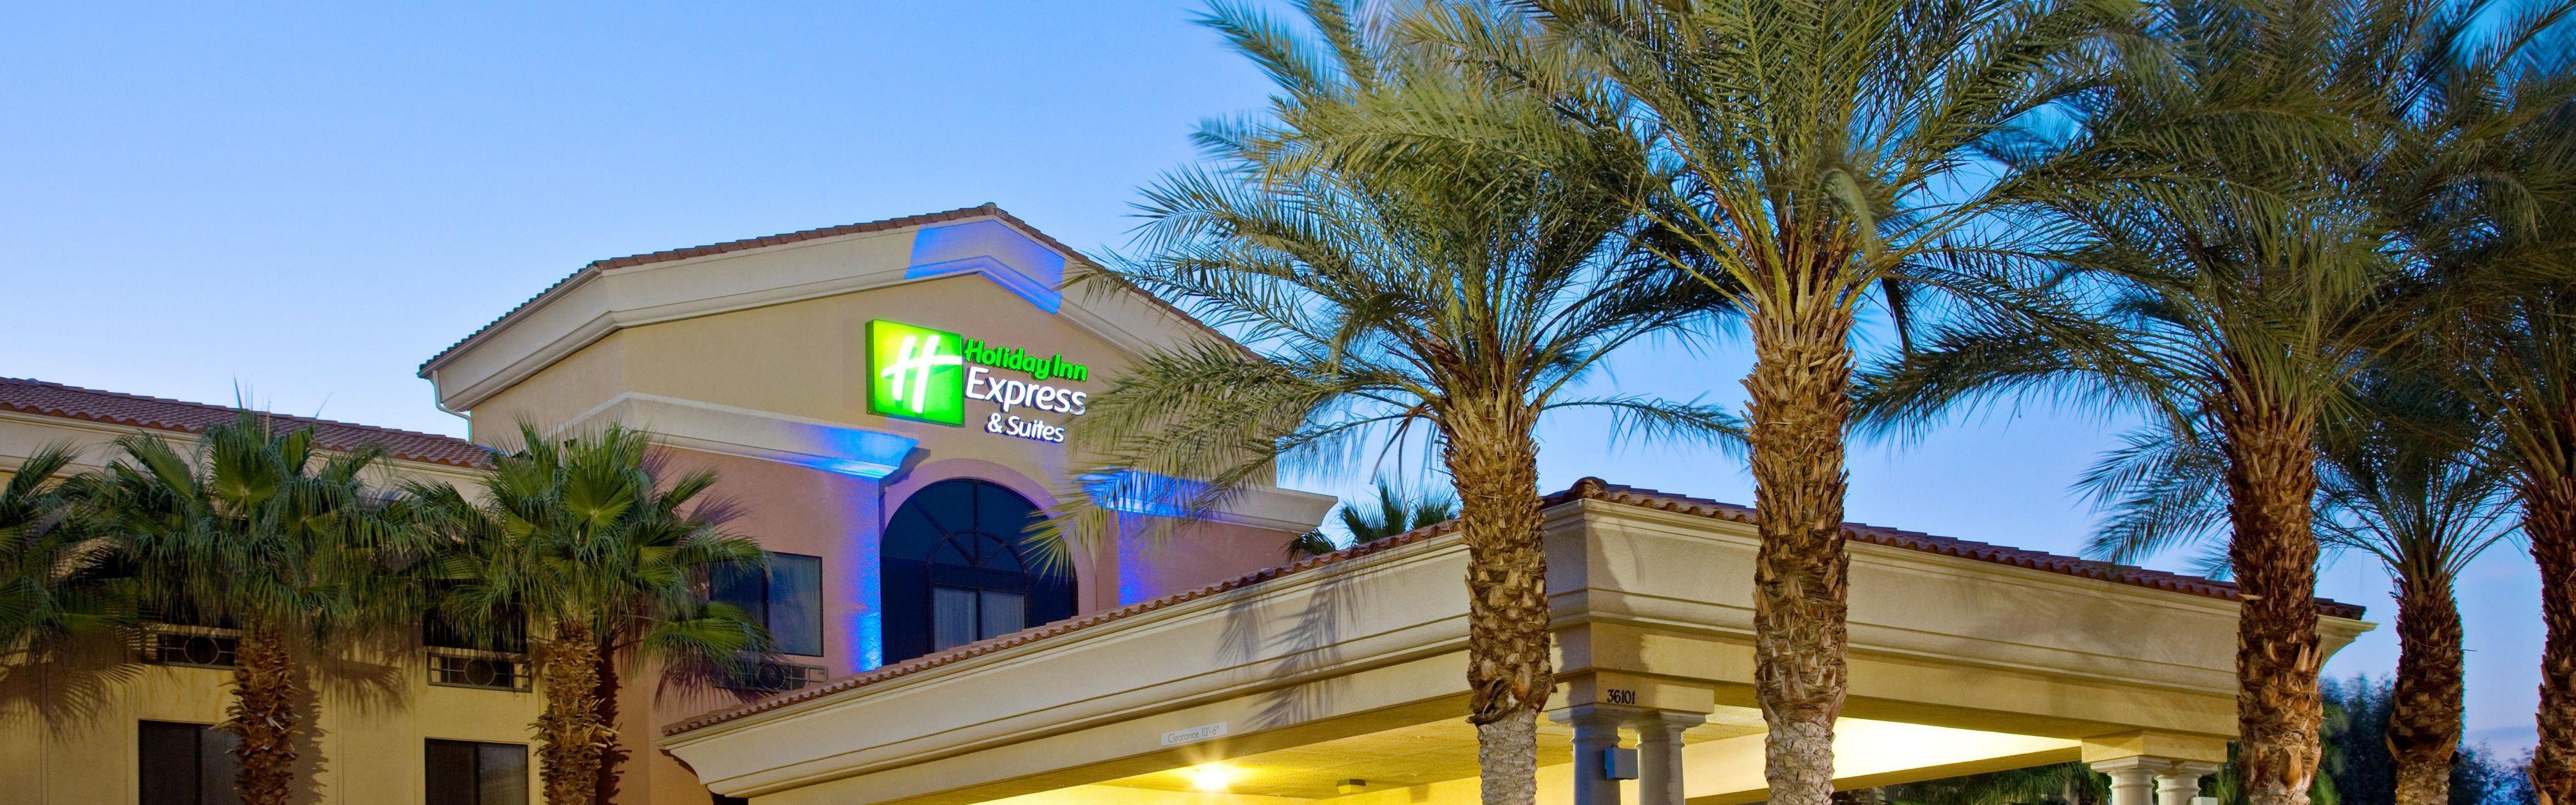 Holiday Inn Express Coupons December 2018